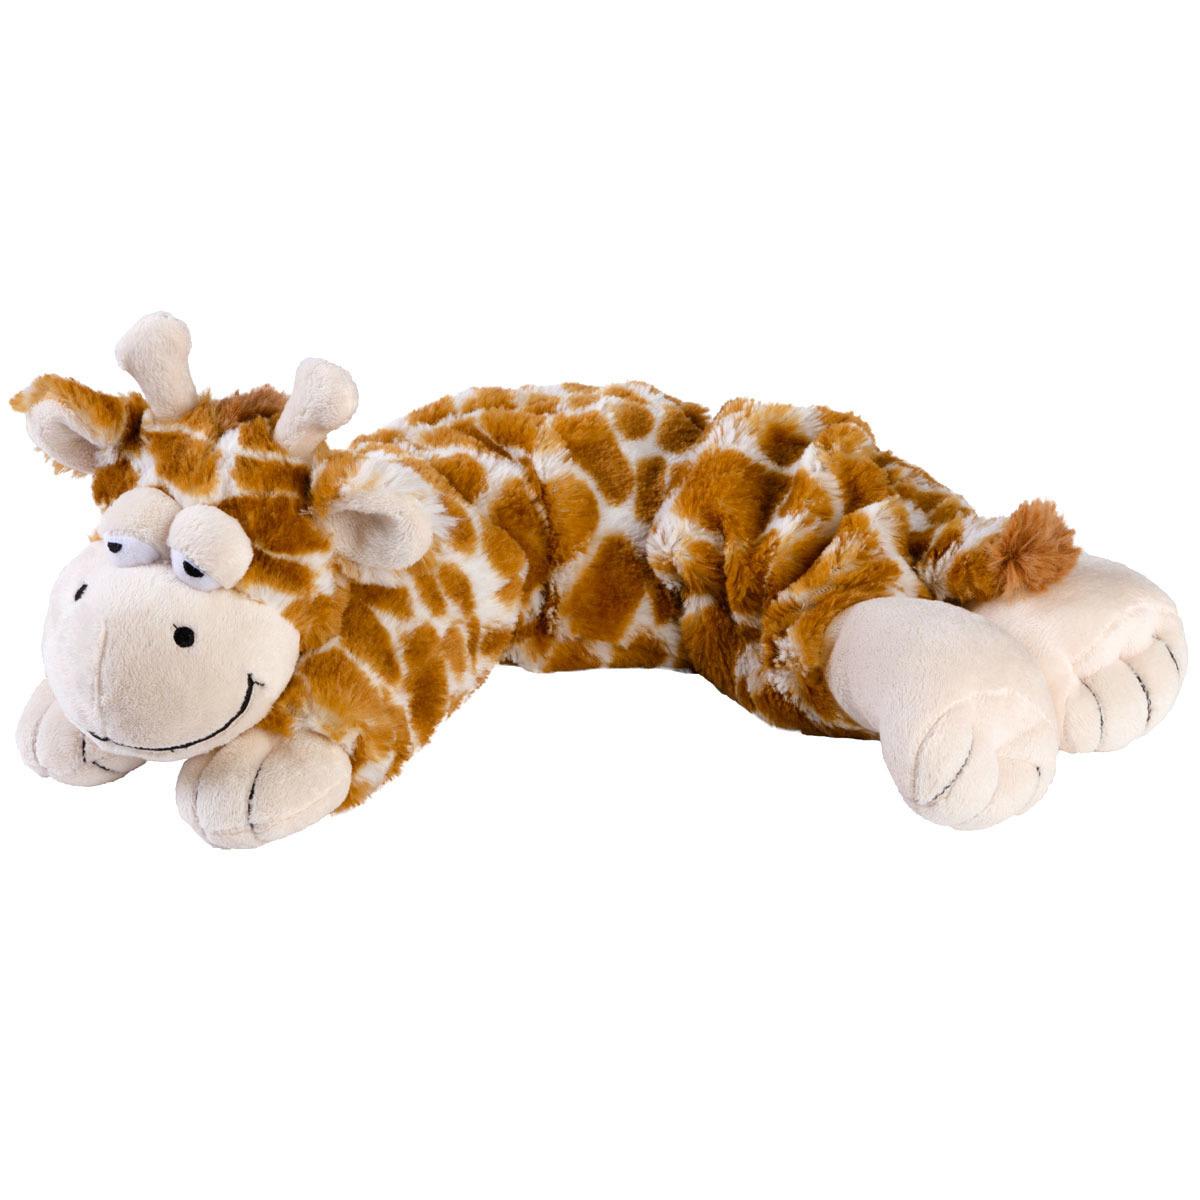 Giraffen speelgoed artikelen opwarmbare giraf knuffelbeest geel 50 cm